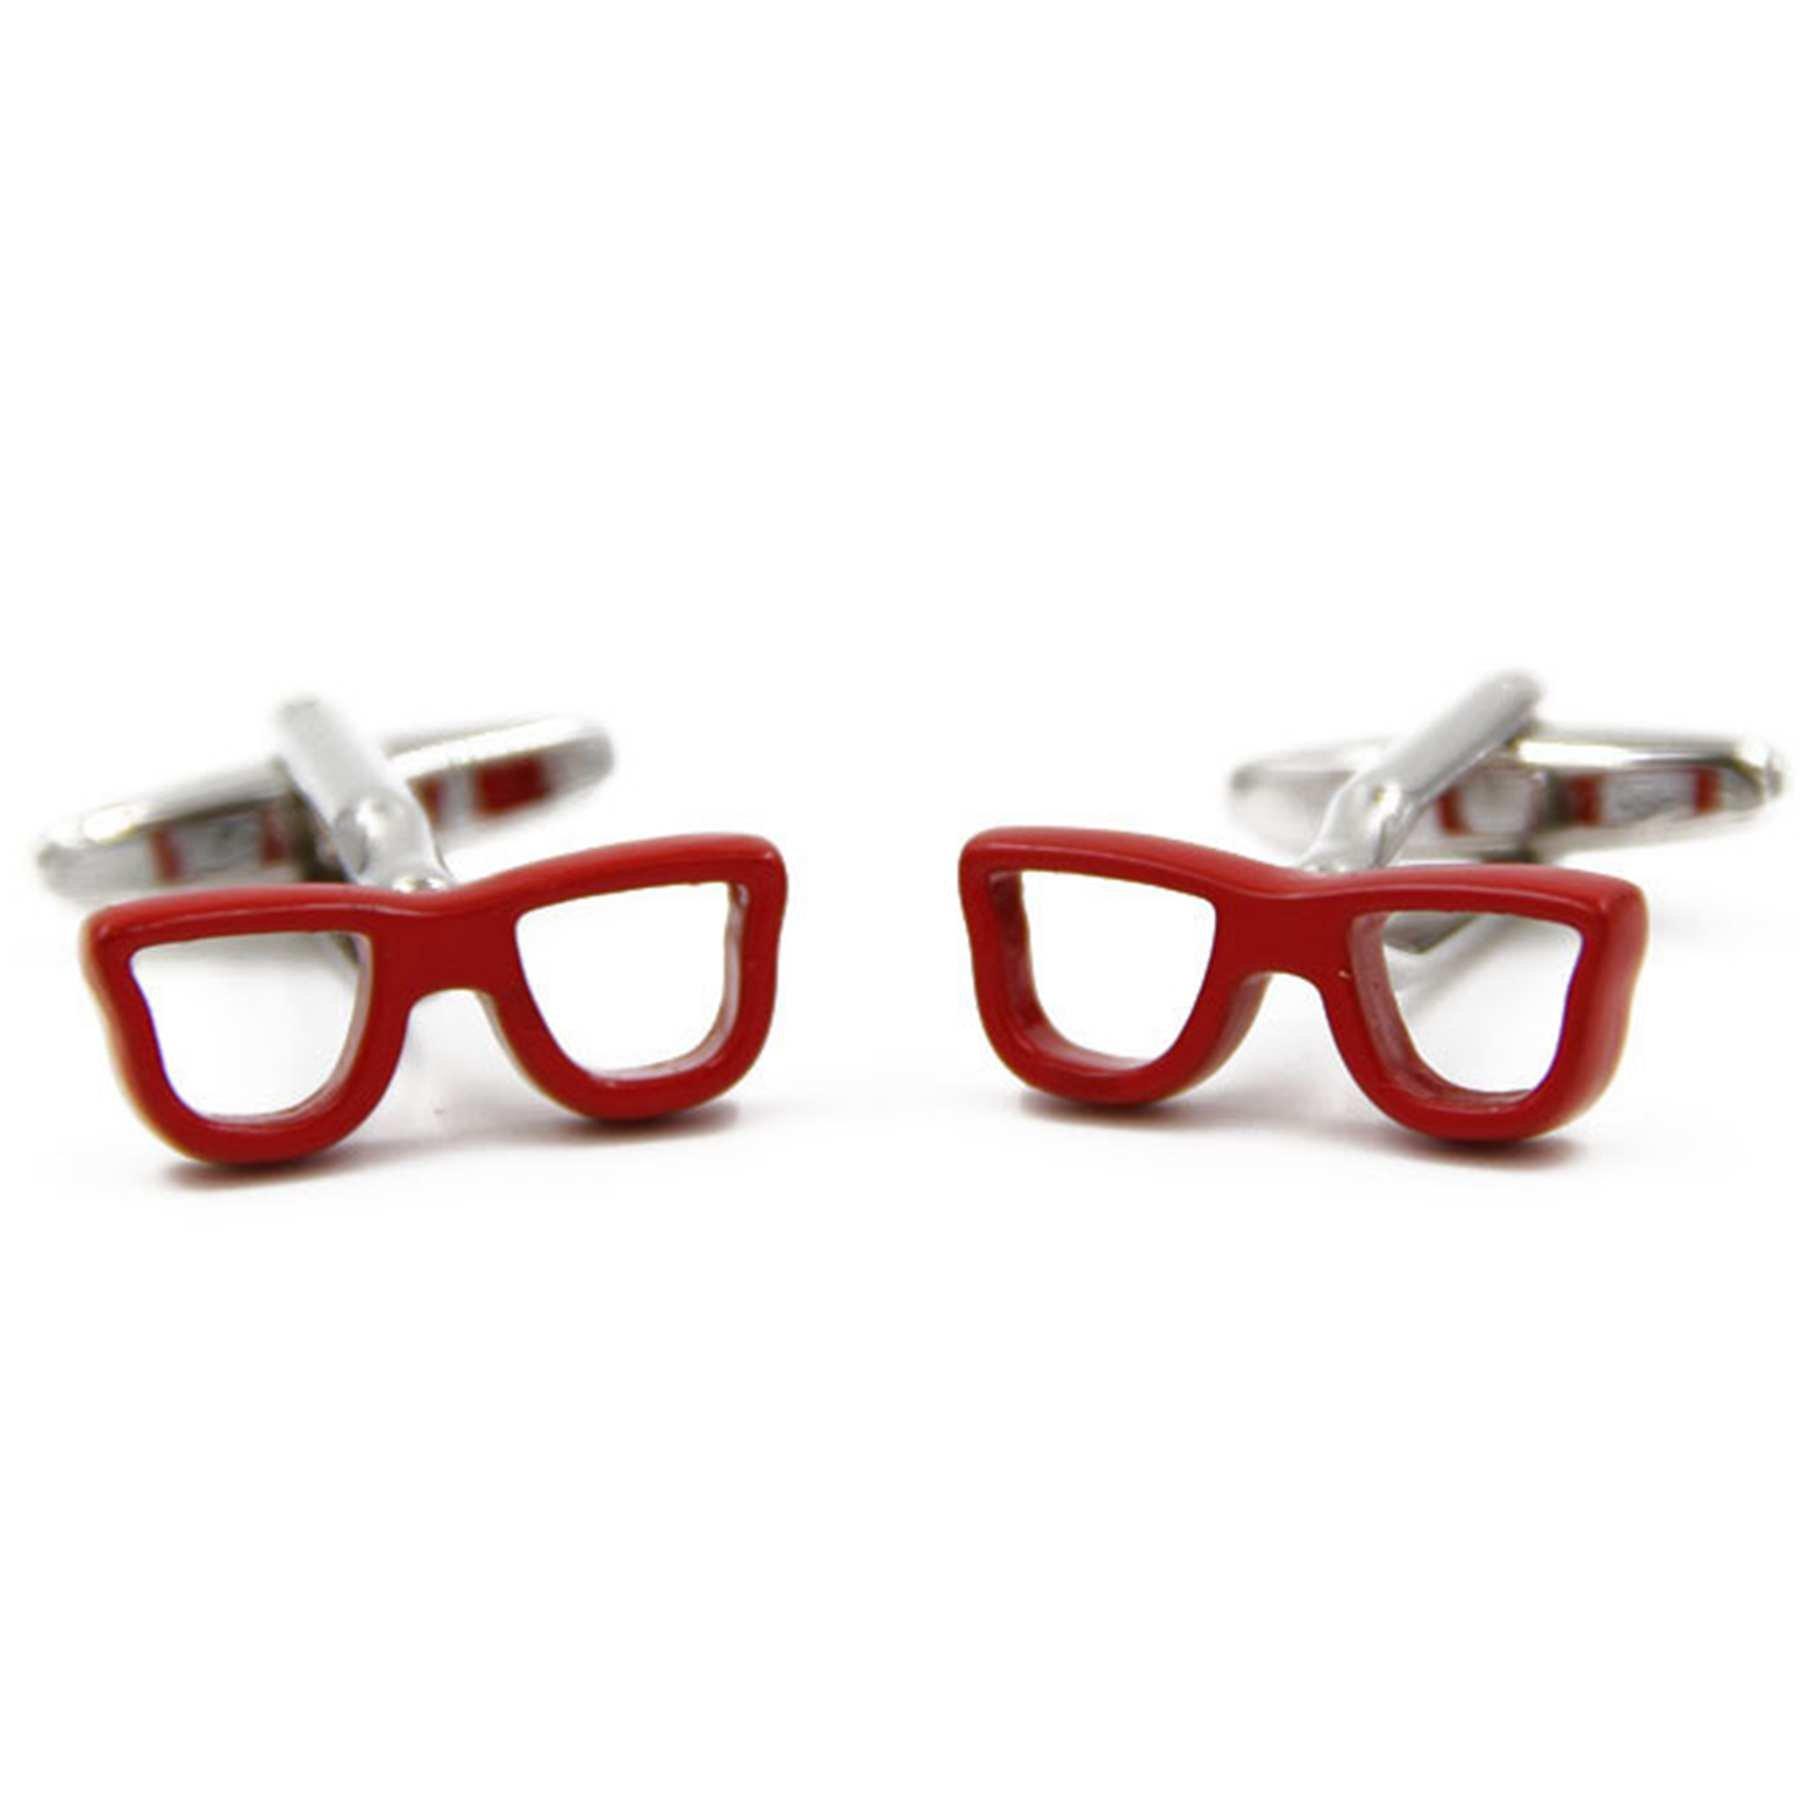 Graybird Funny Red Glasses Cufflinks Shirt Wedding Cufflinks for Men's French Shirt